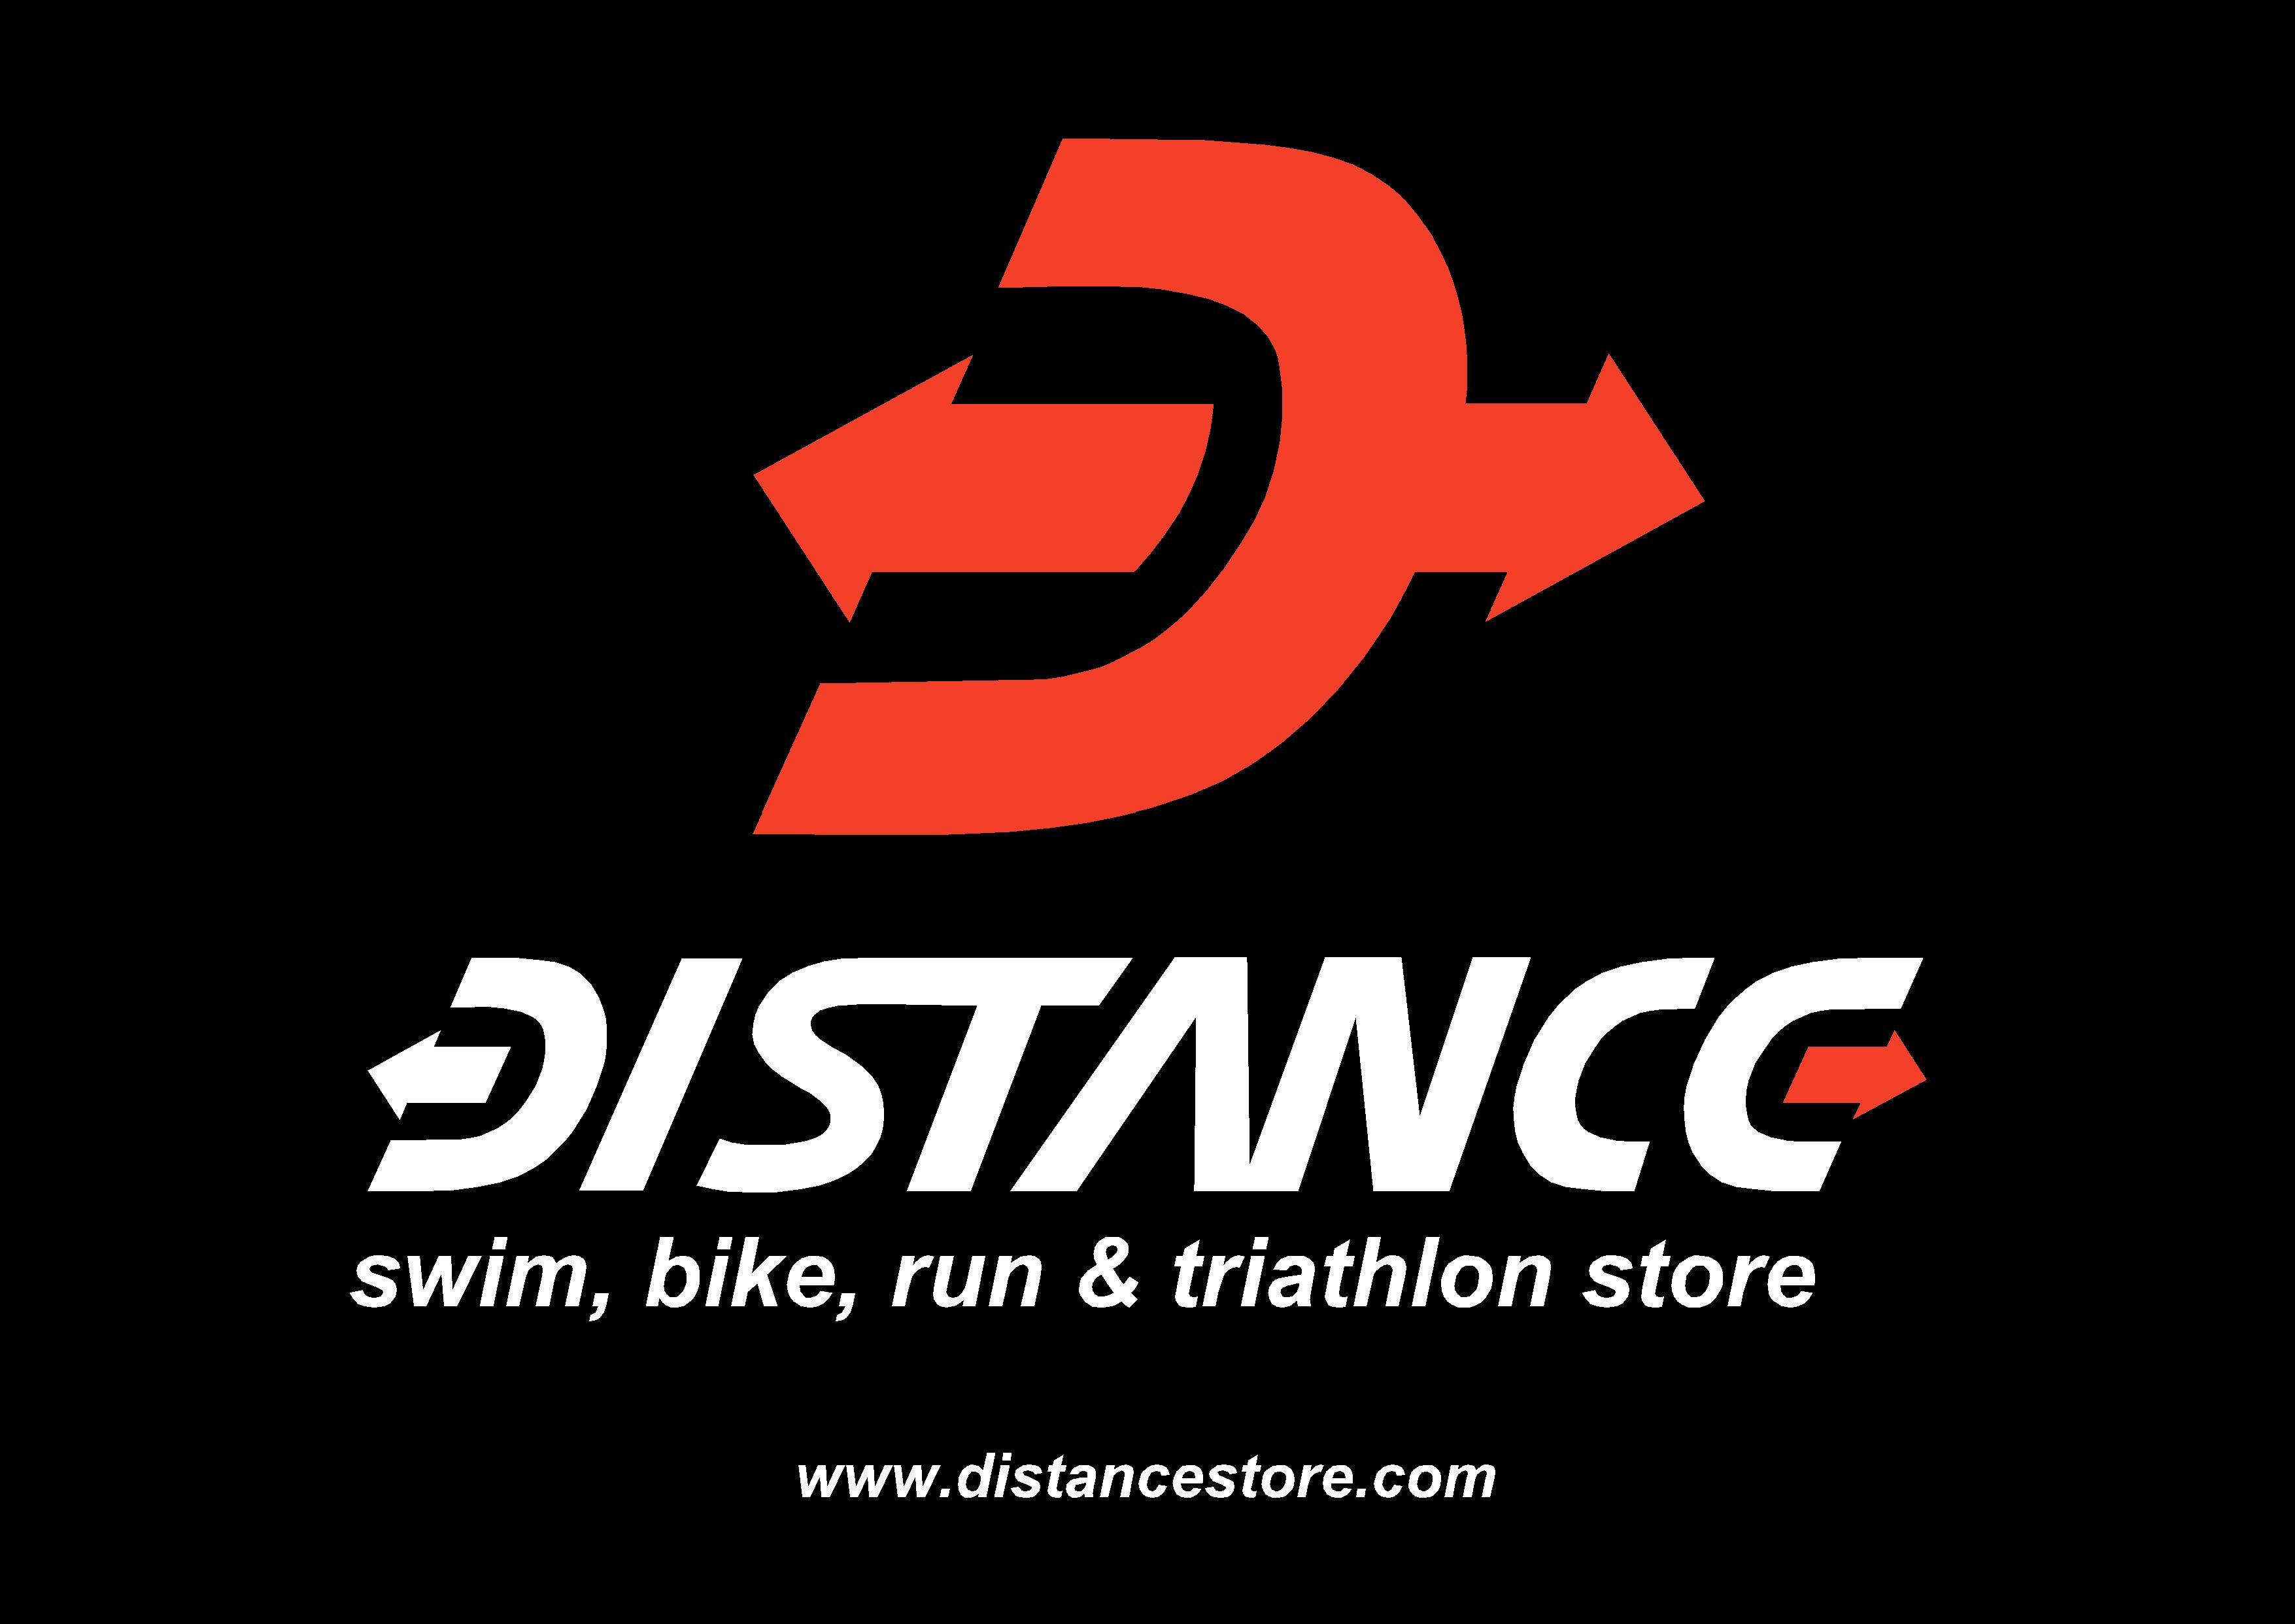 www.distancestore.com/